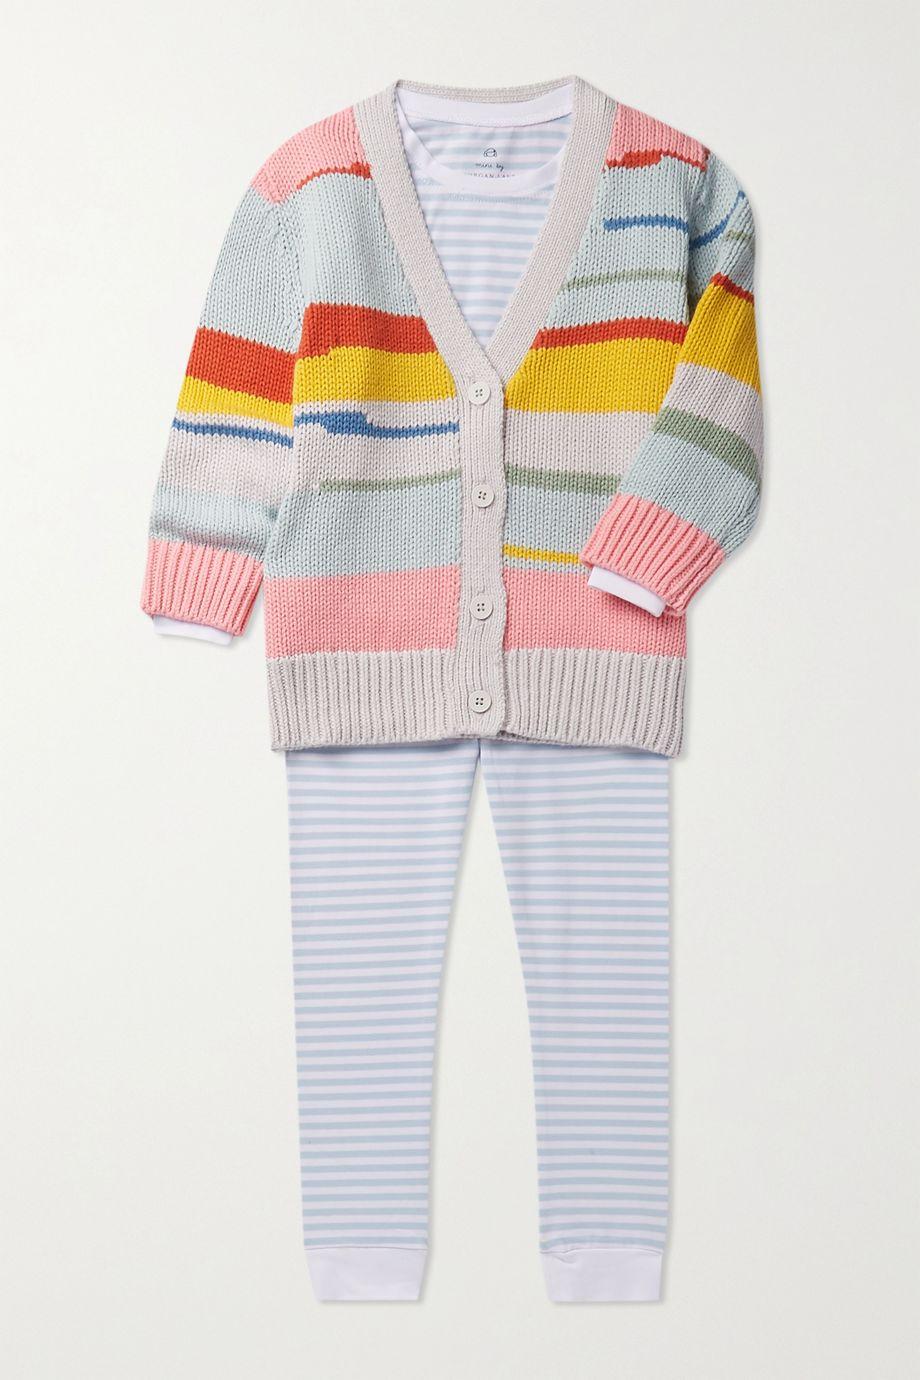 Morgan Lane Kids Lulu ages 1 - 8 striped stretch-cotton jersey pajama set